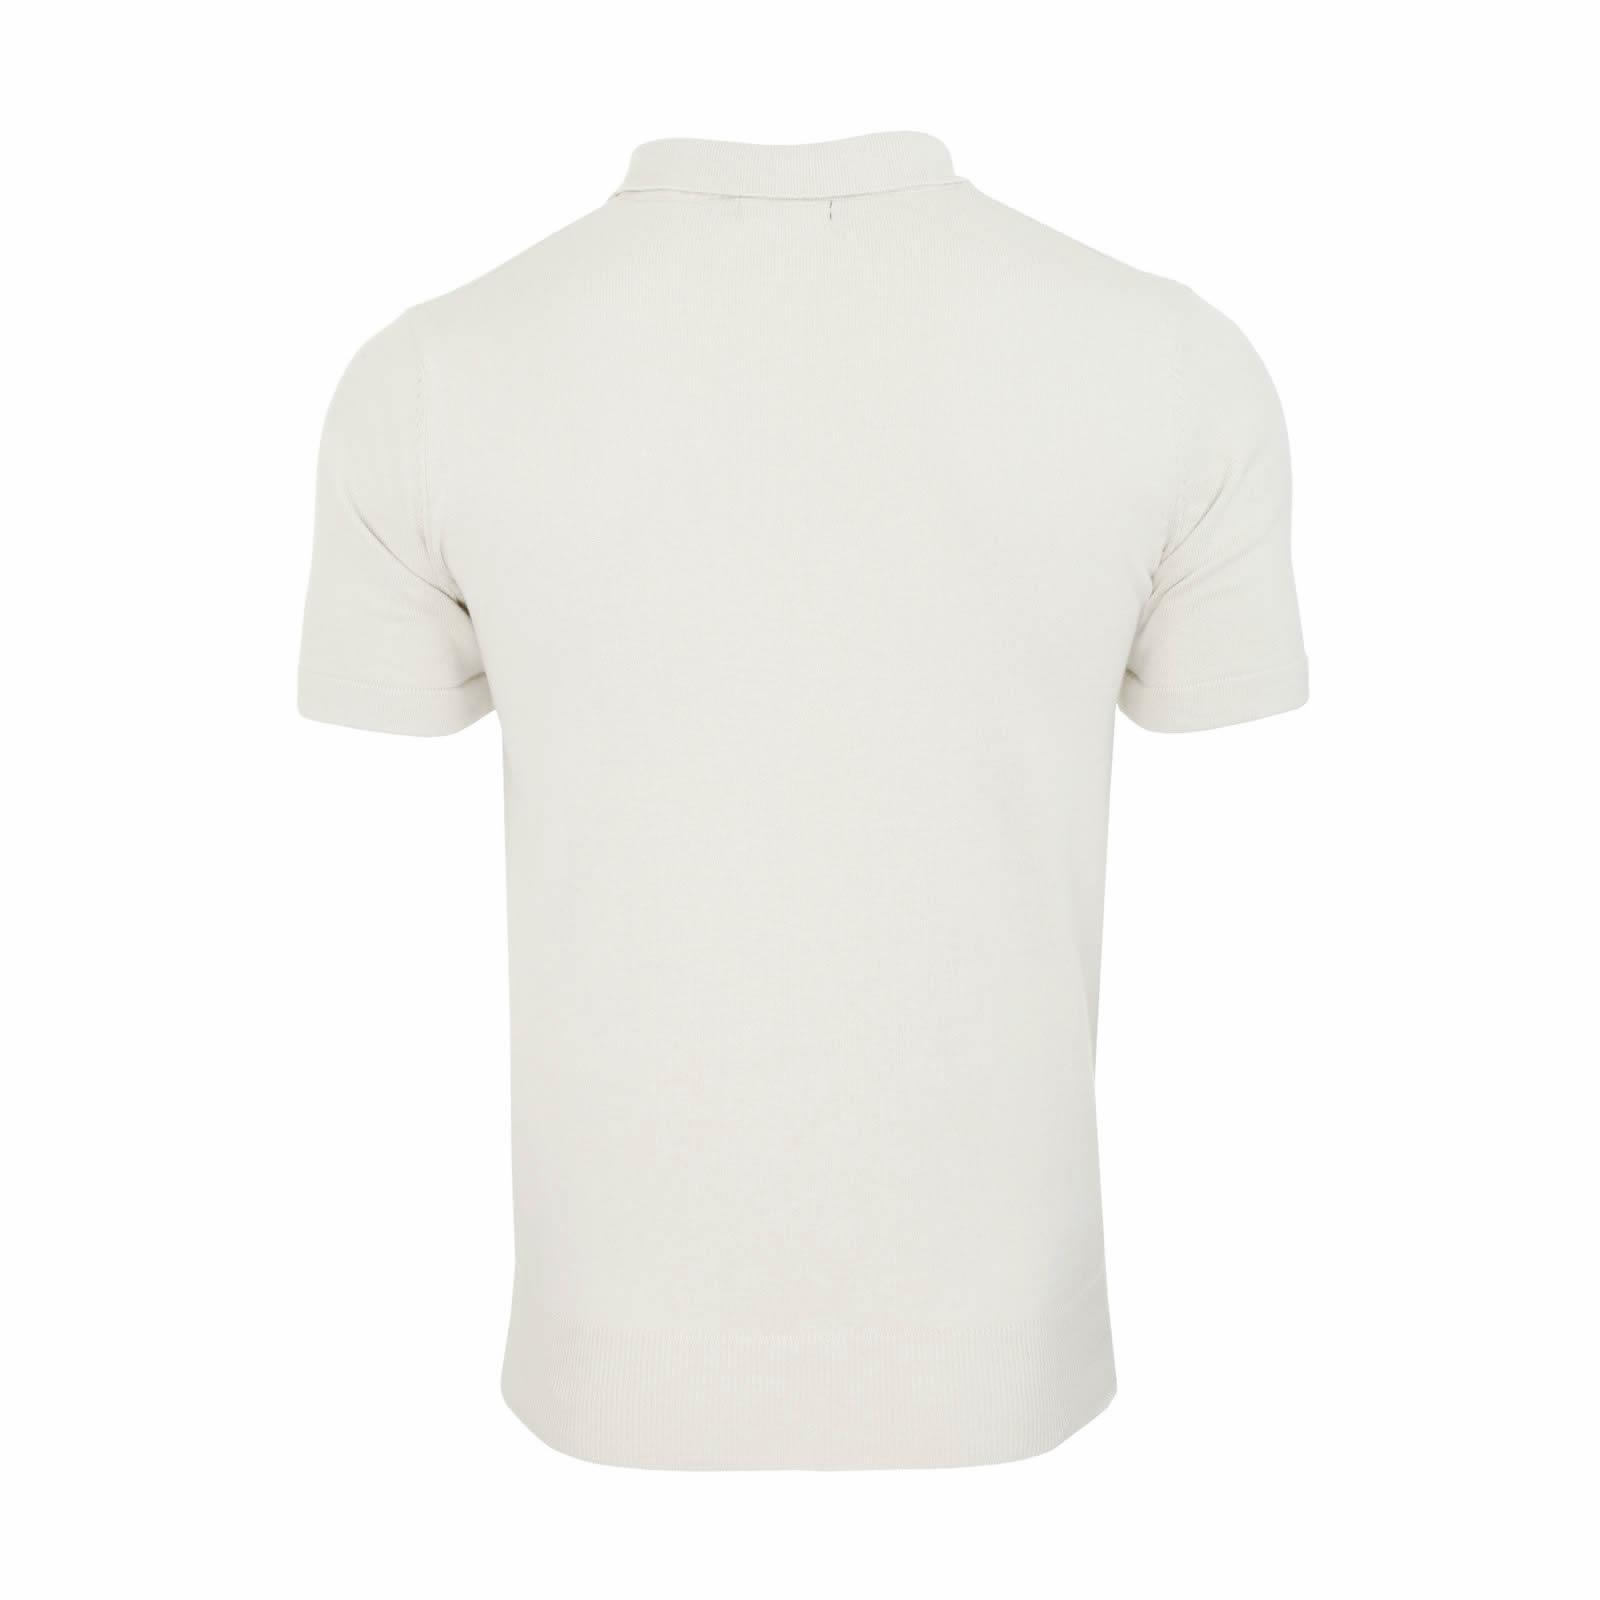 Mens-Knitted-Polo-Brave-Soul-Columbus-Collared-Short-Sleeve-Jumper-T-Shirt thumbnail 17